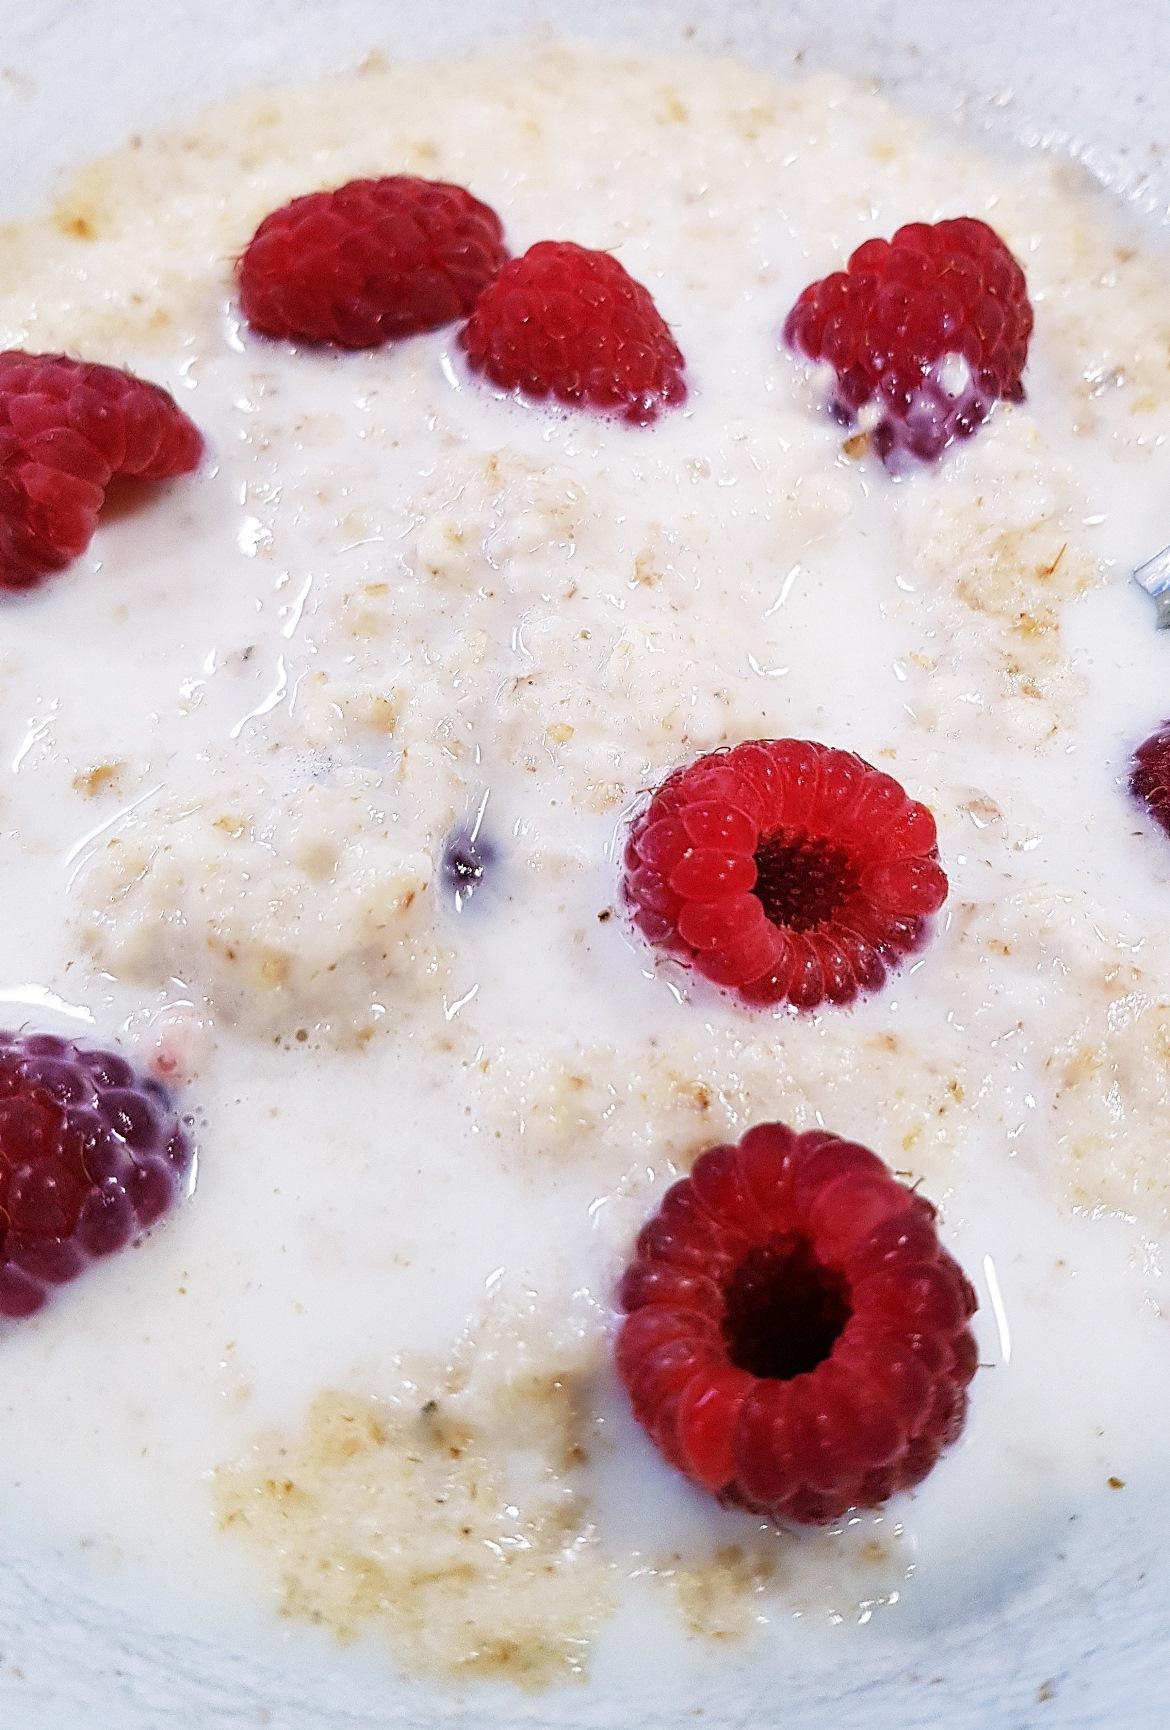 Raspberries and porridge - April 2018 Monthly Recap by BeckyBecky Blogs